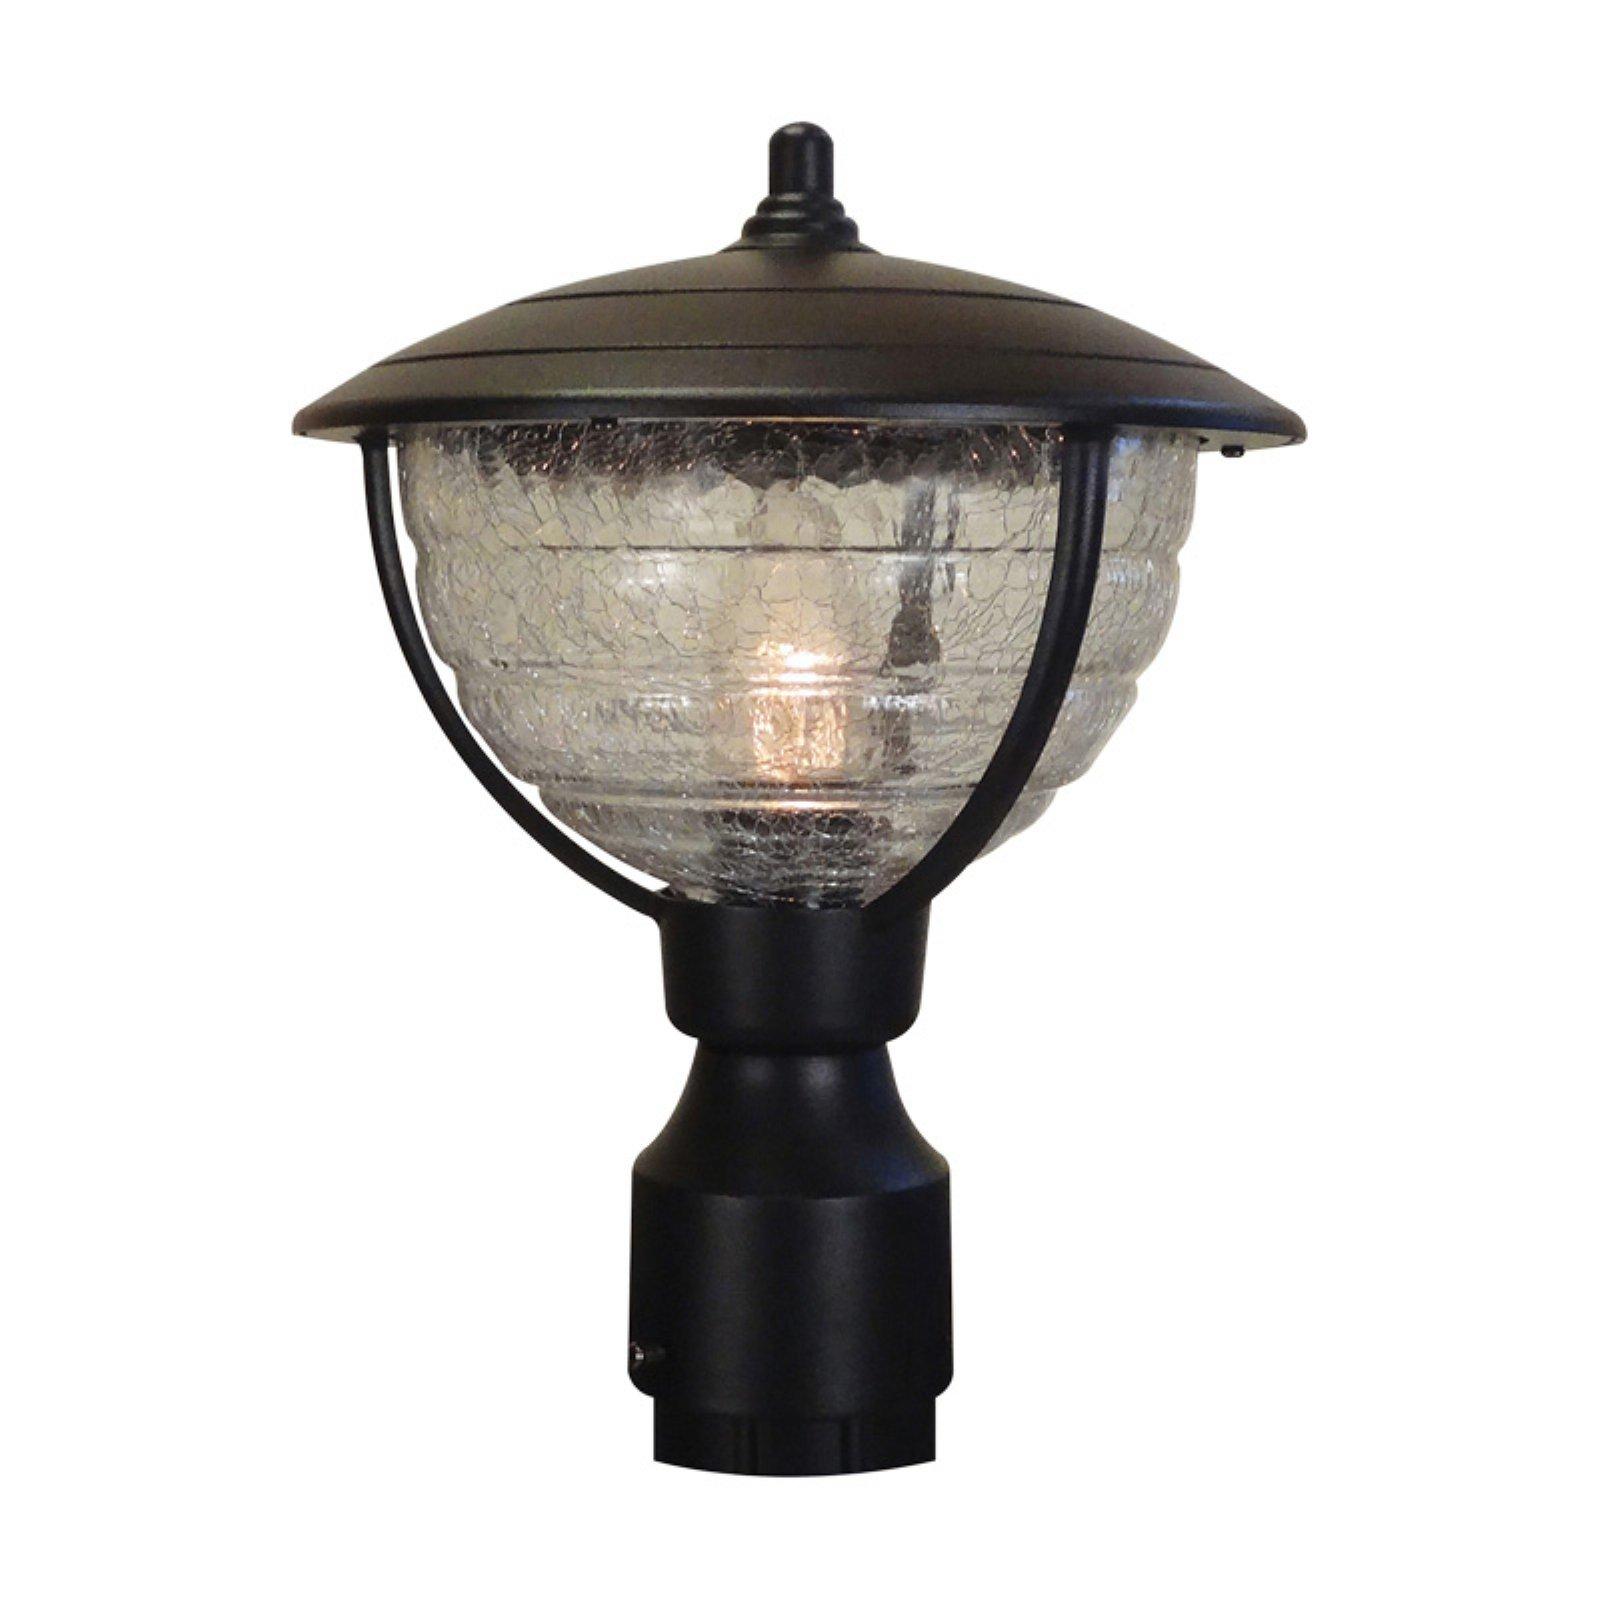 Special Lite Products Vista F 2910medium Outdoor Post Mount Light